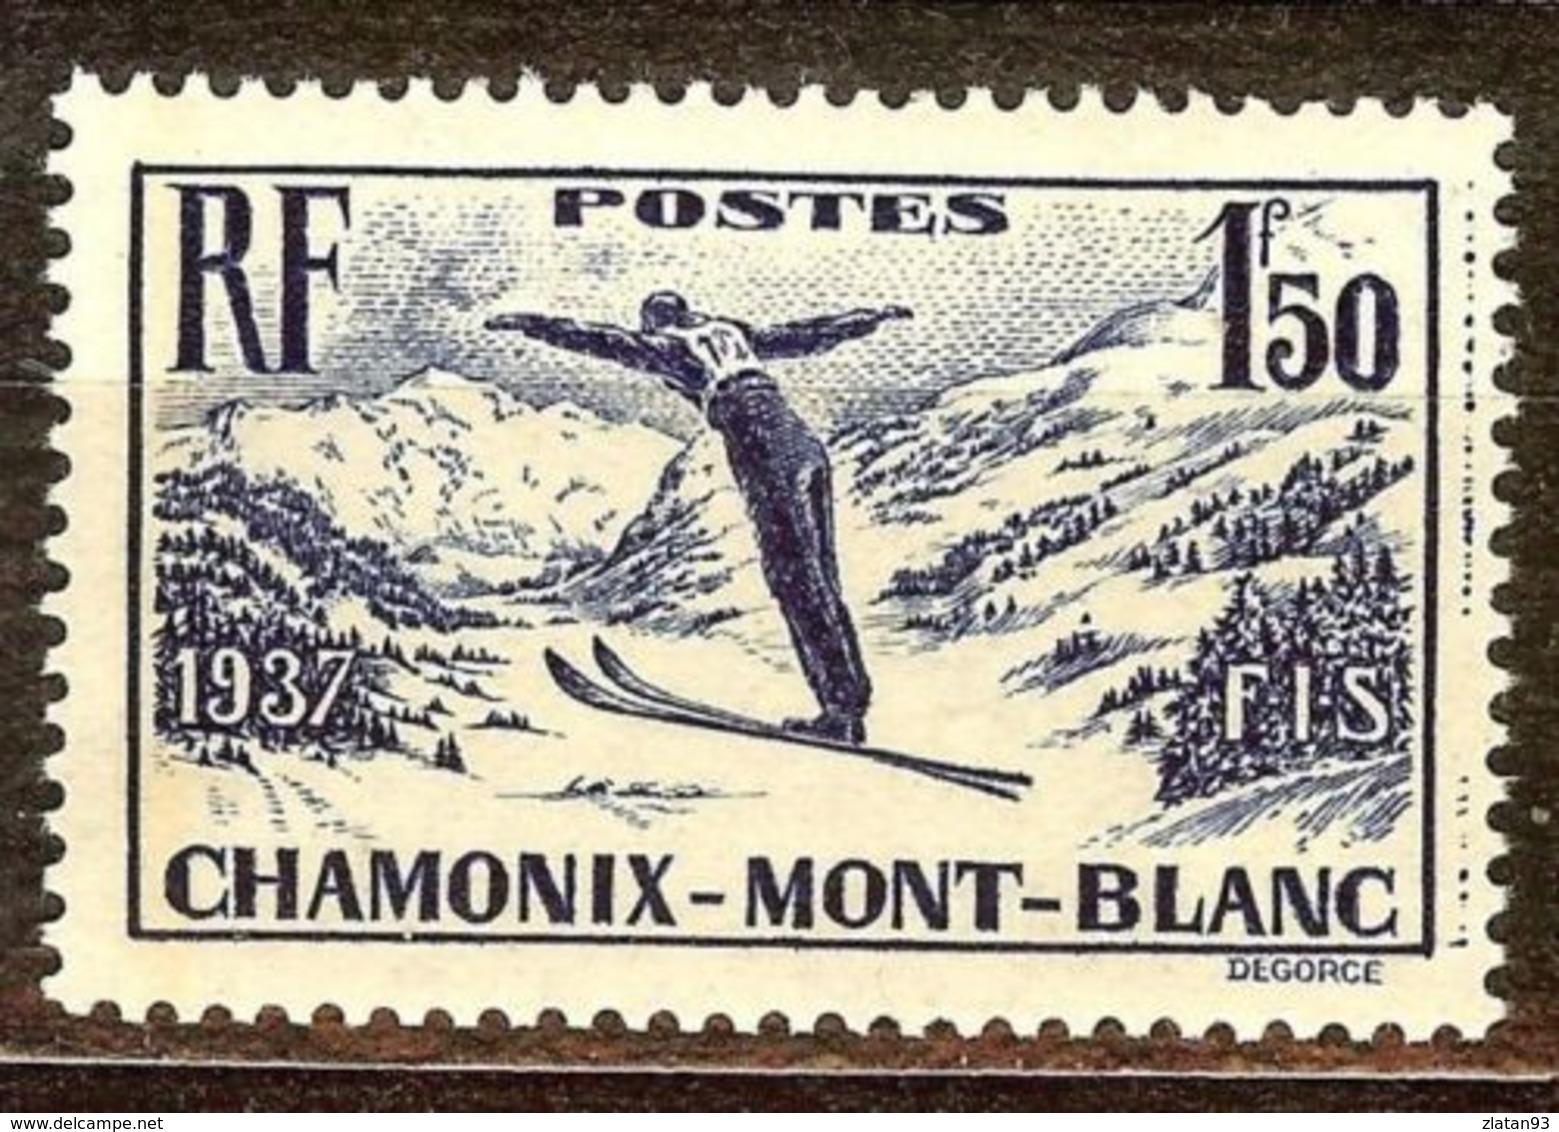 SUPERBE CHAMONIX N°334 NEUF Avec GOMME** Cote 16 Euro PAS D'AMINCI - Ungebraucht